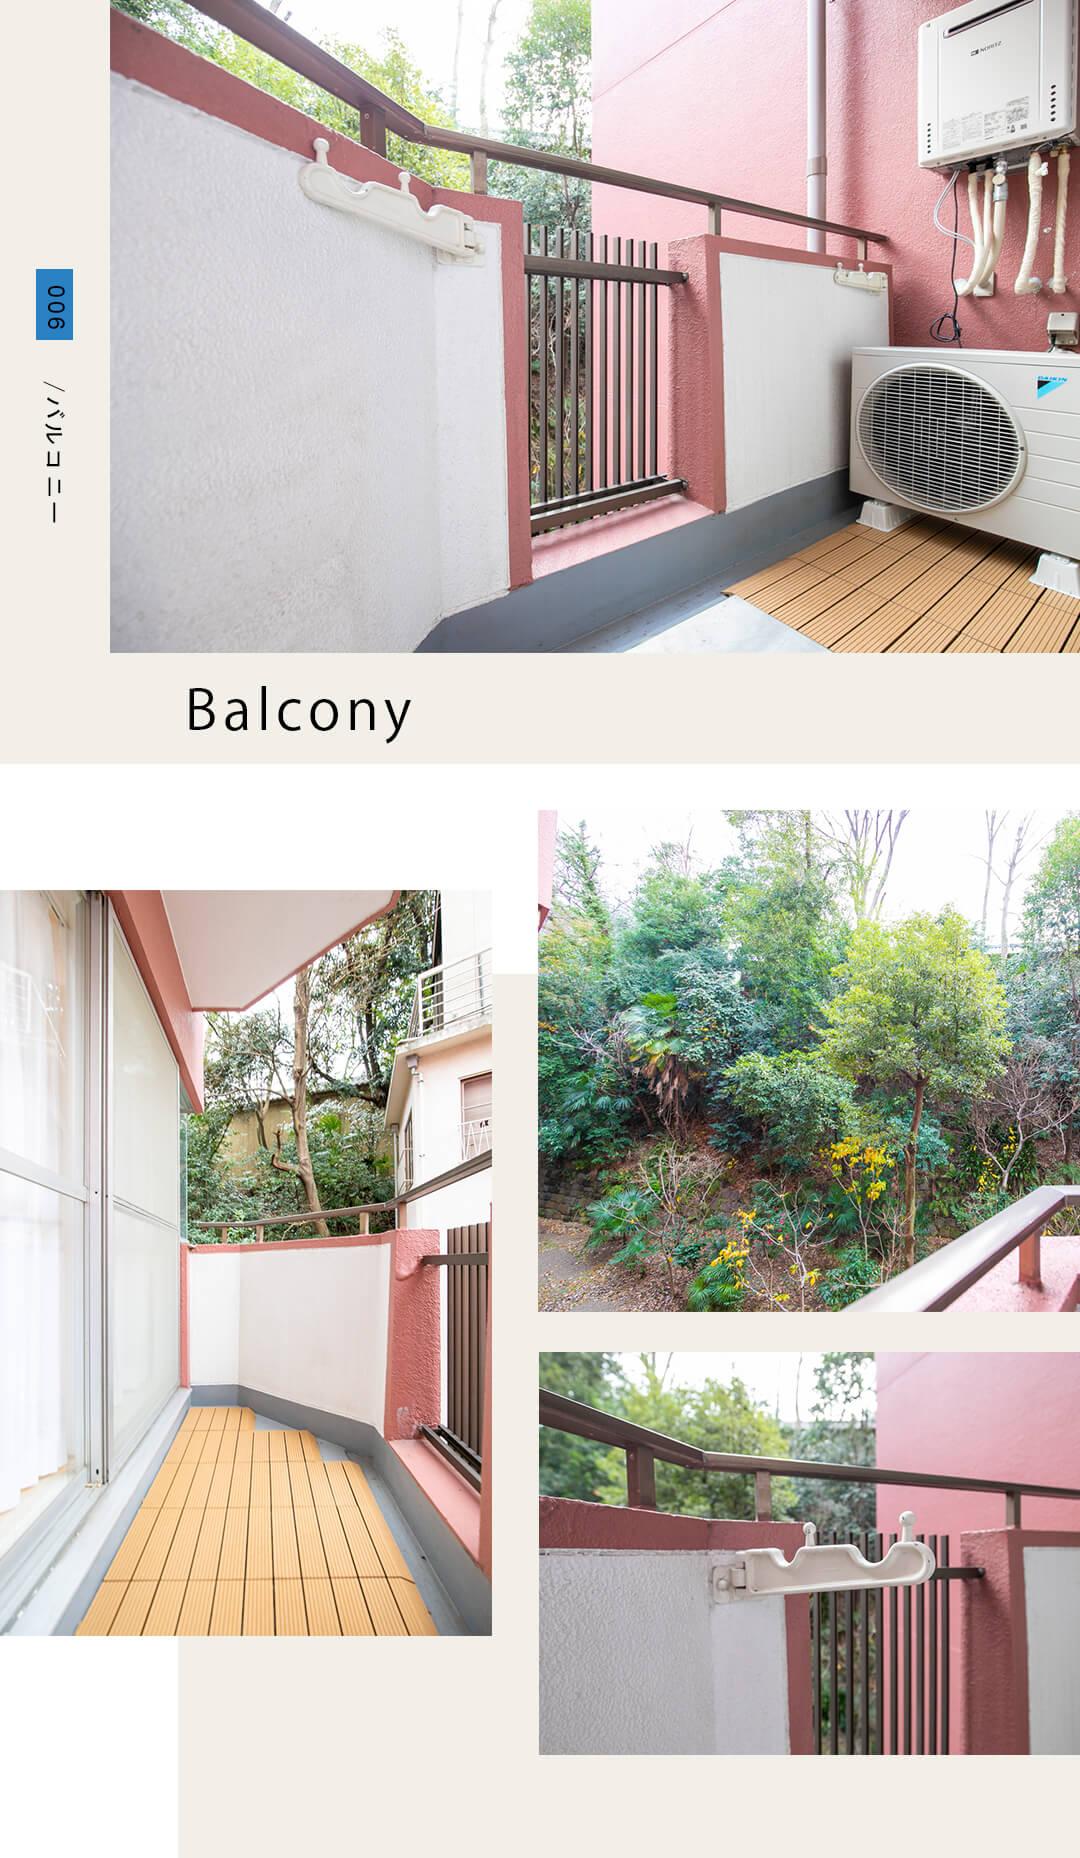 006,Balcony,バルコニー